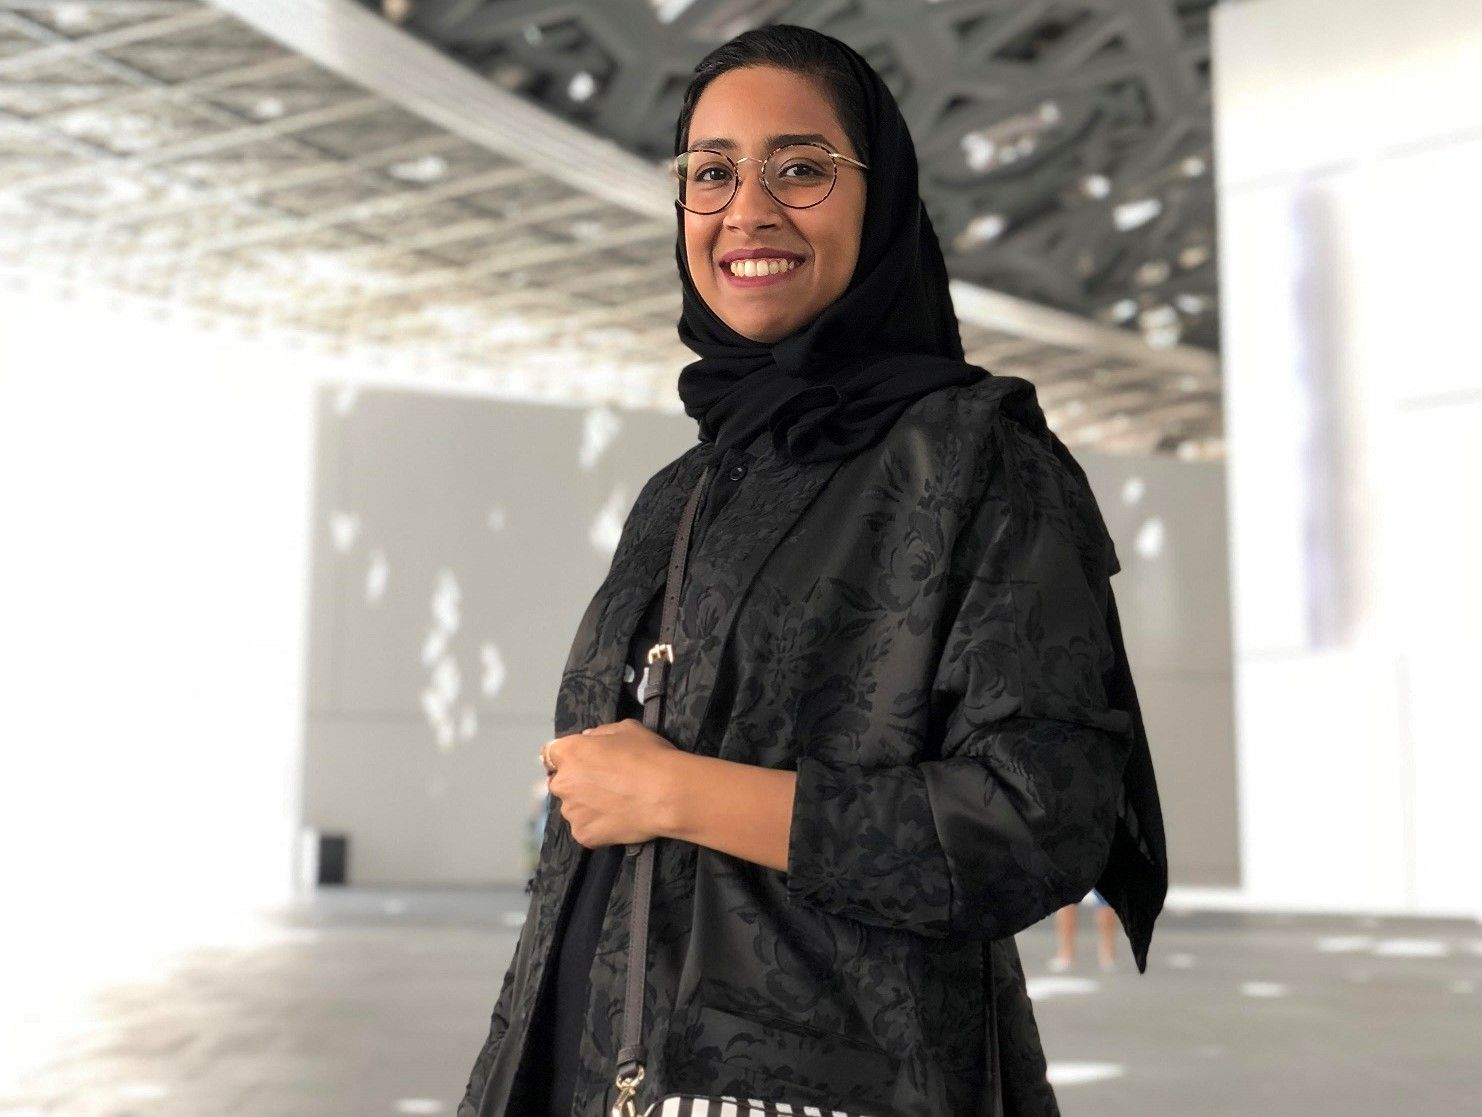 Manar Saud Alomayri